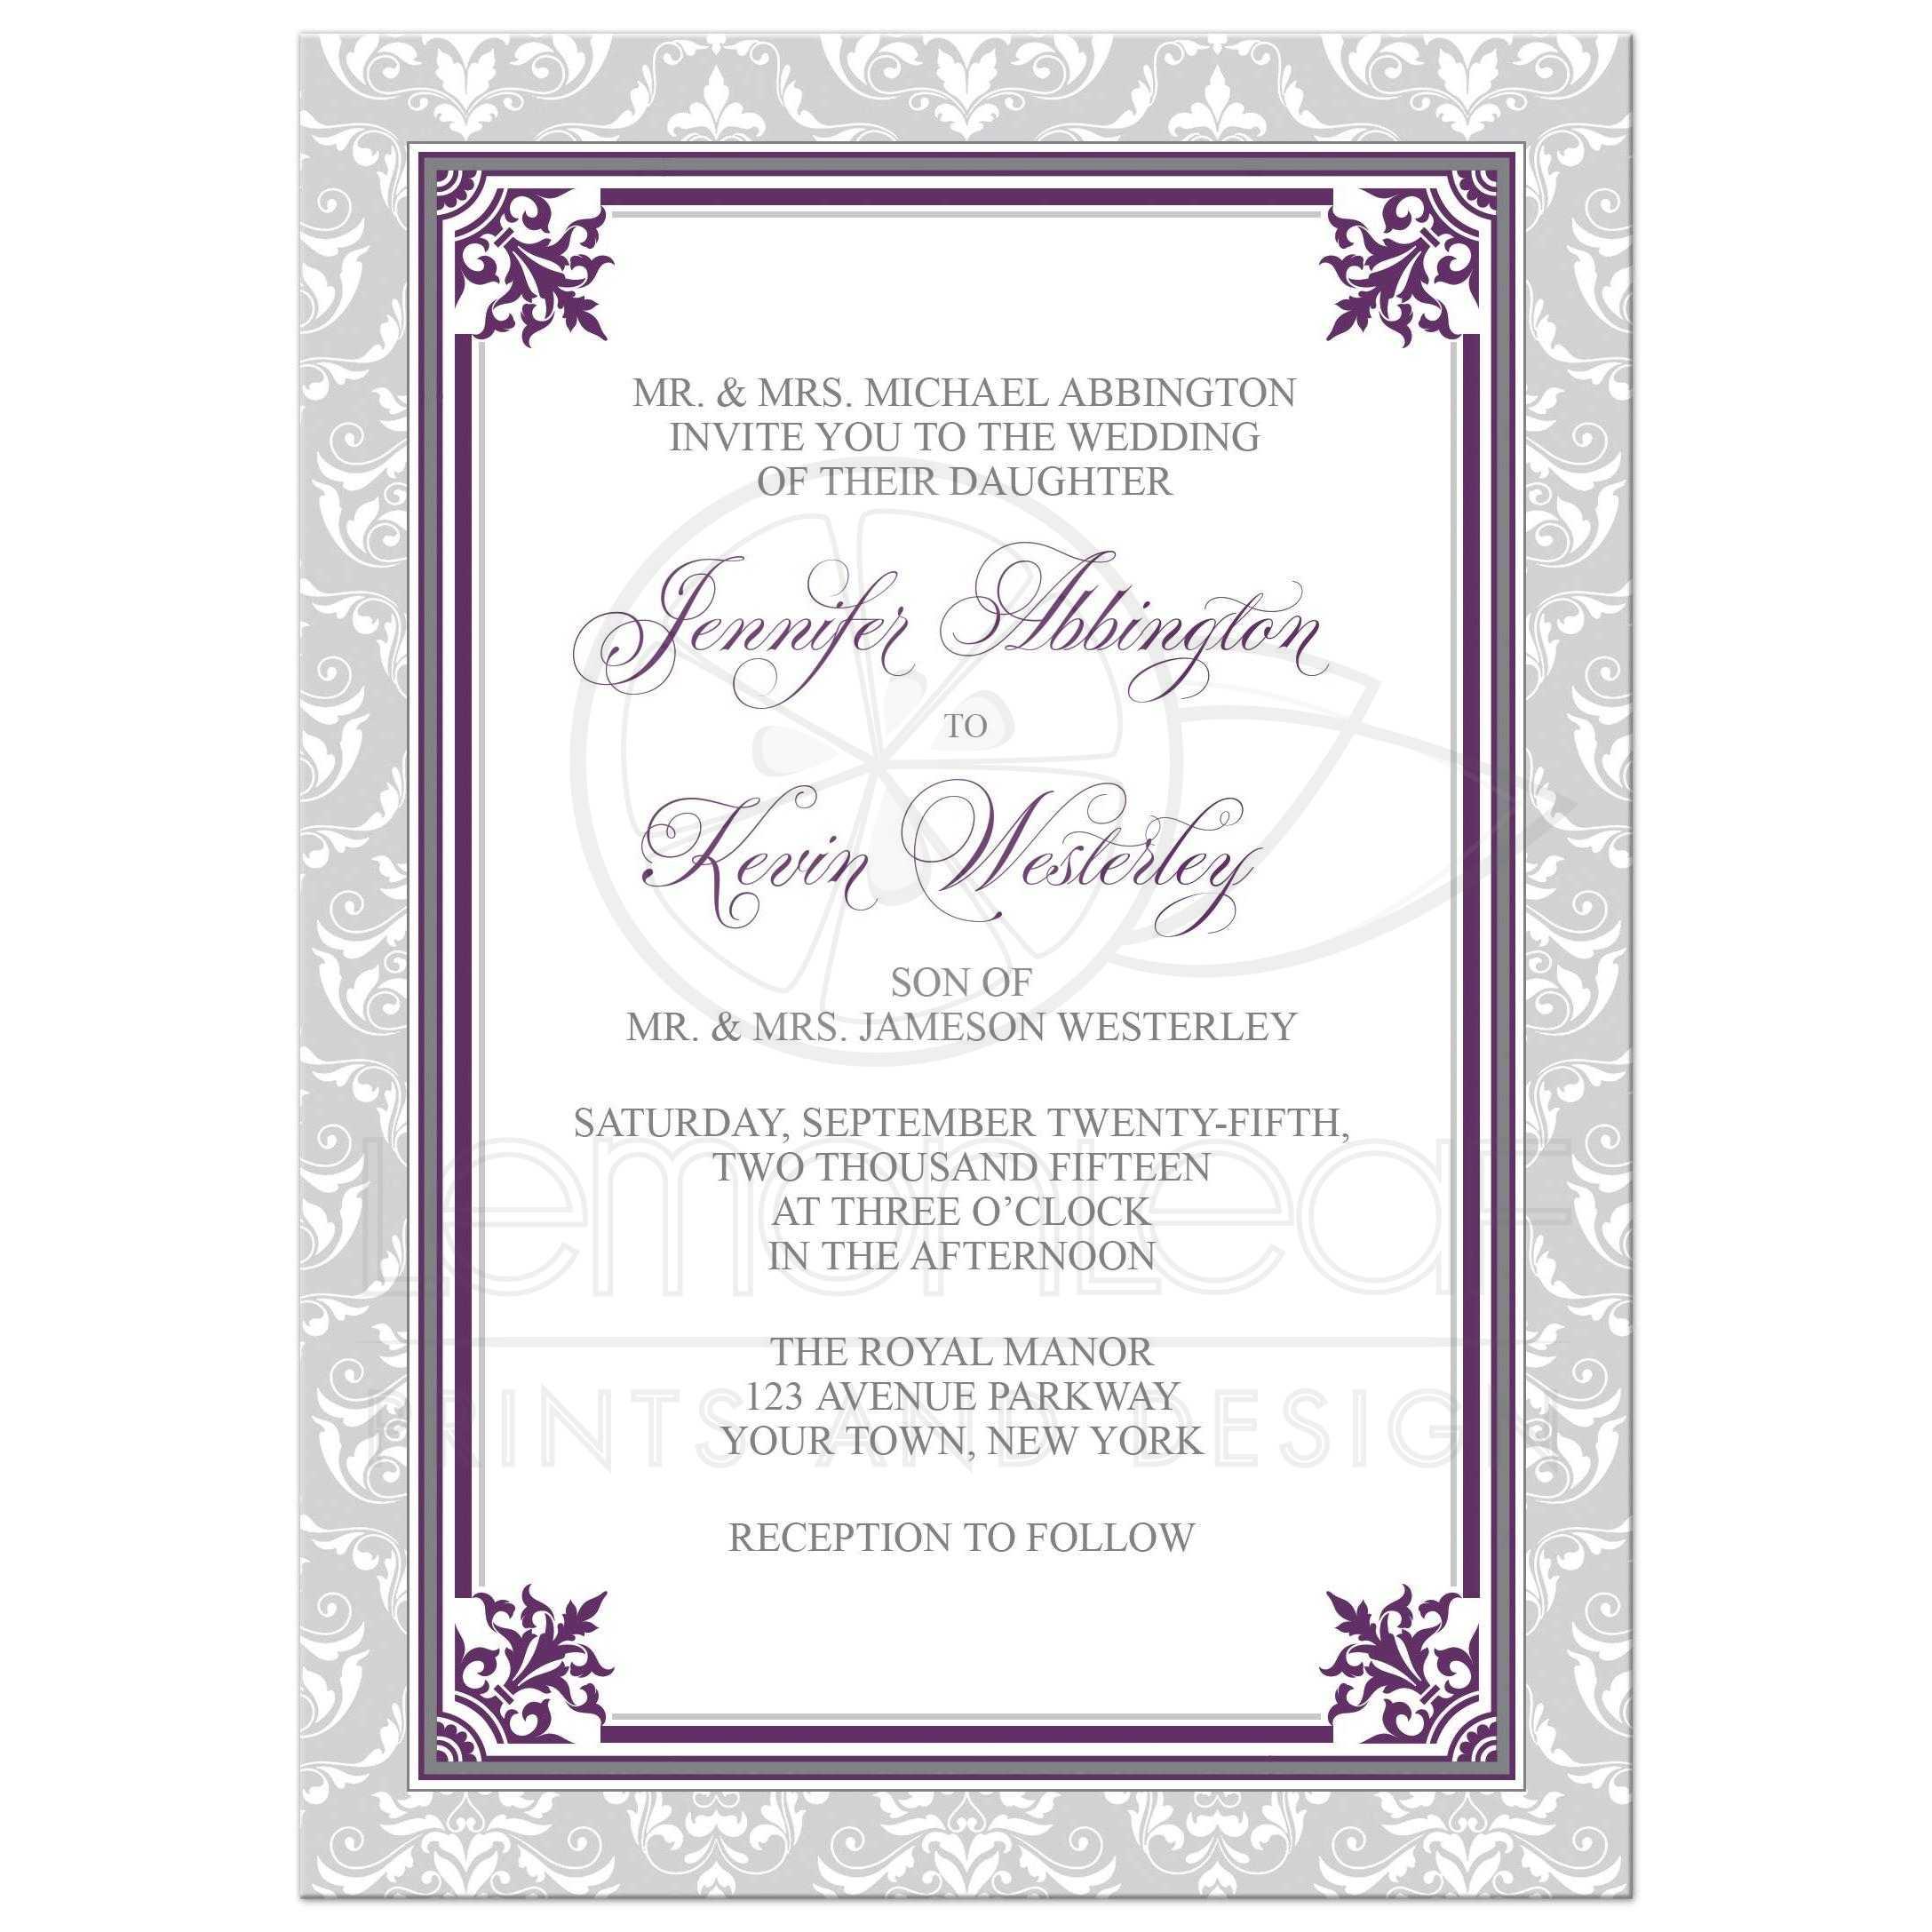 Wedding Invitations - Plum Purple and Gray Elegant Damask